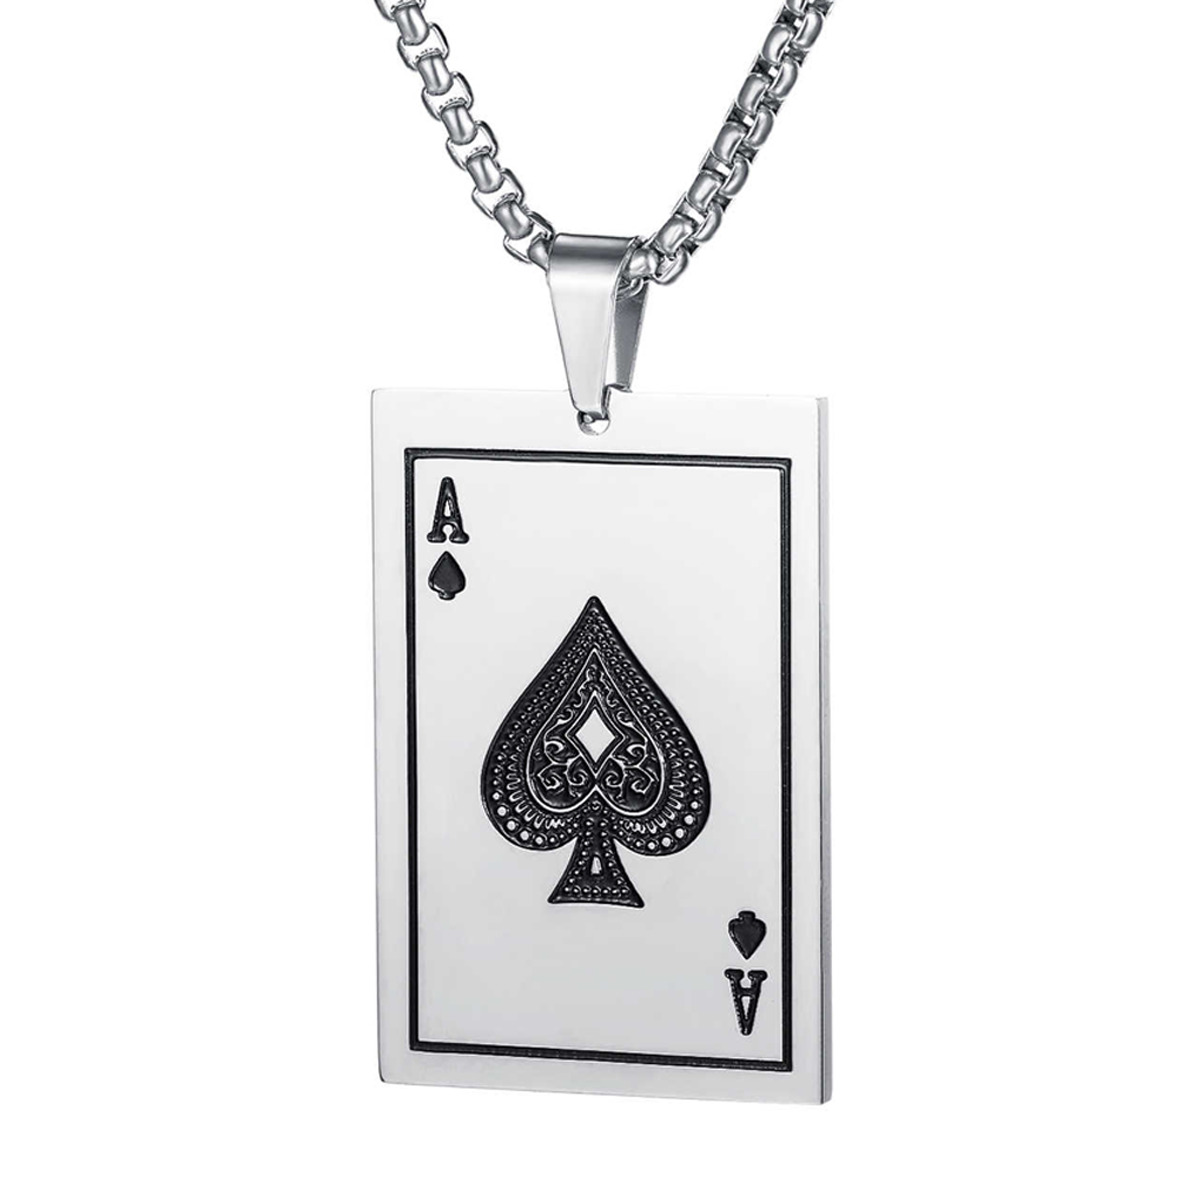 Collar Carta Poker Carta As Buena Suerte Acero Inoxidable Plateado